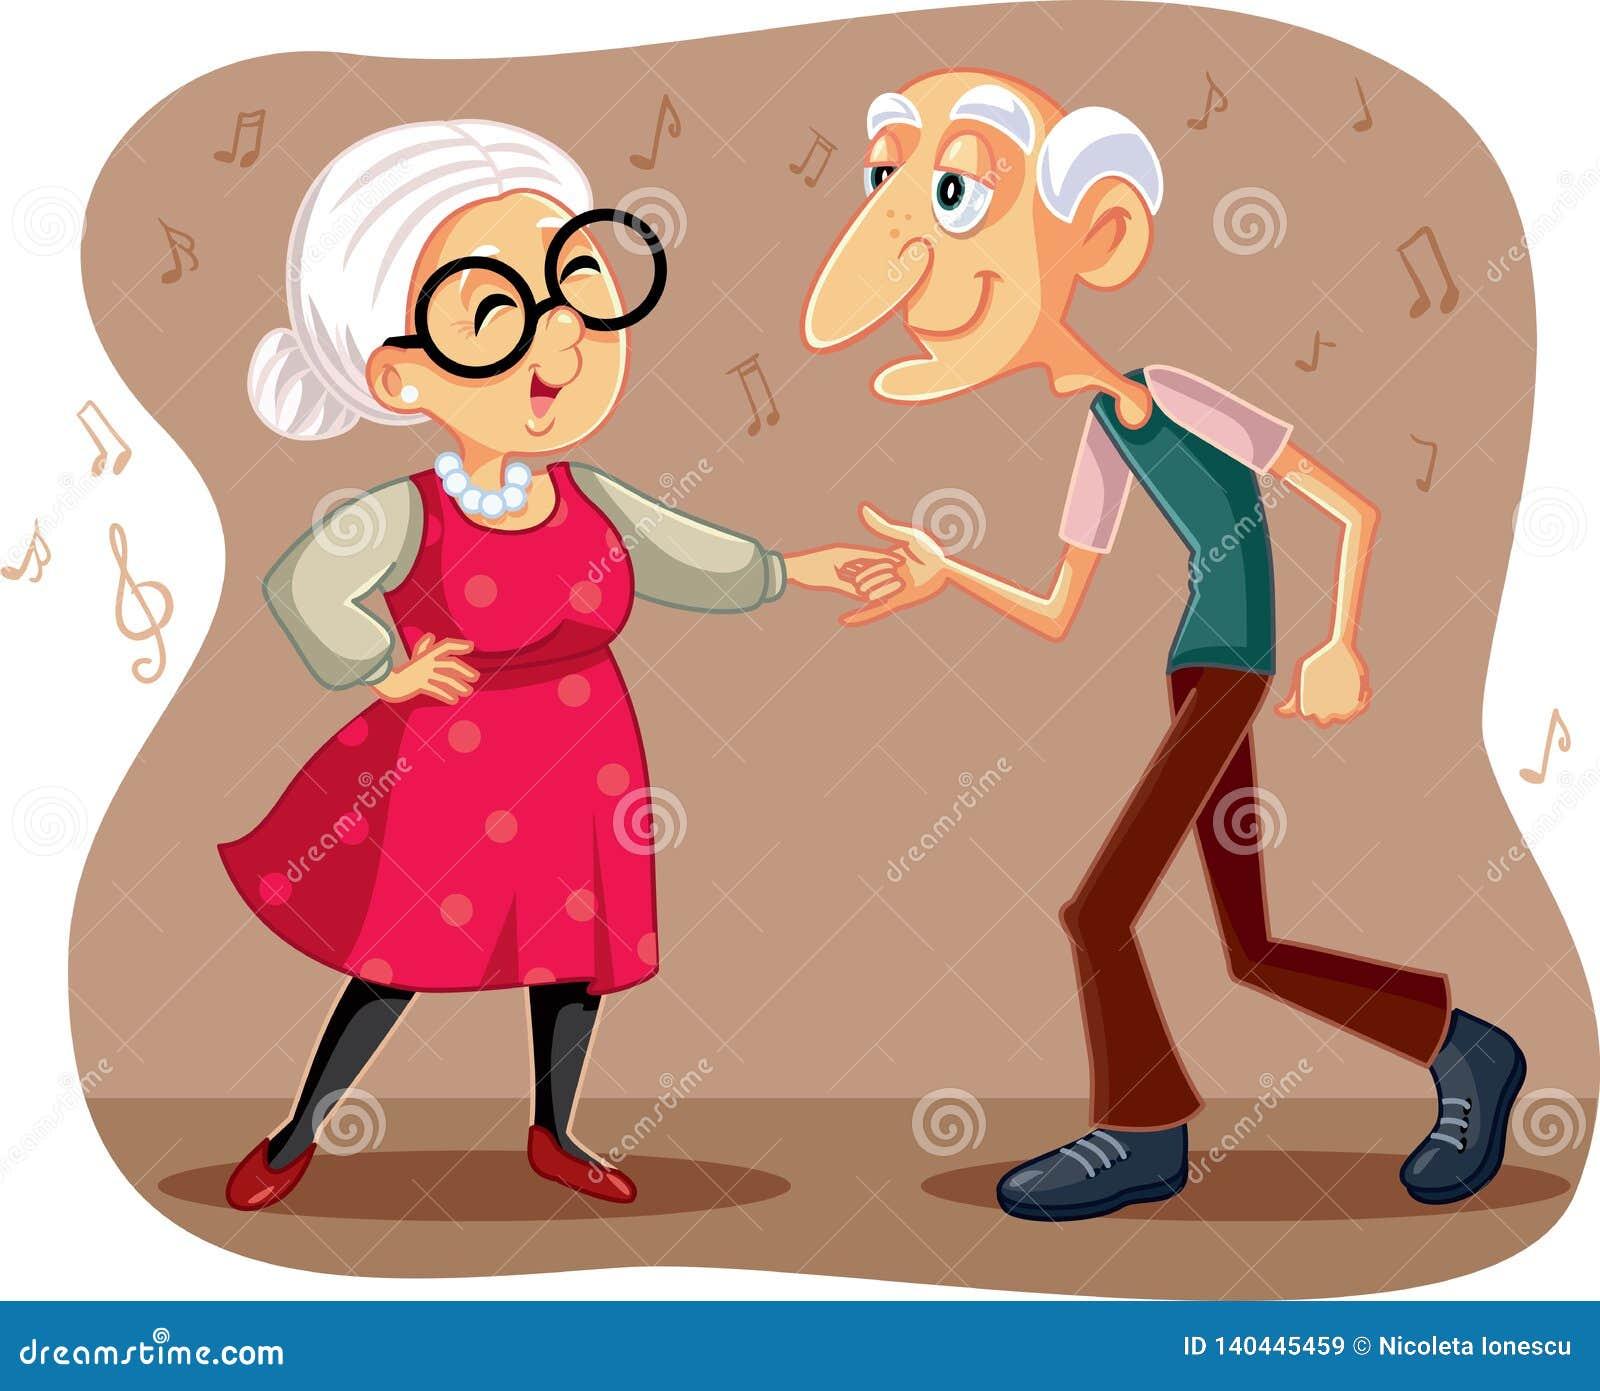 Funny Elderly Couple Dancing Vector Cartoon Stock Vector